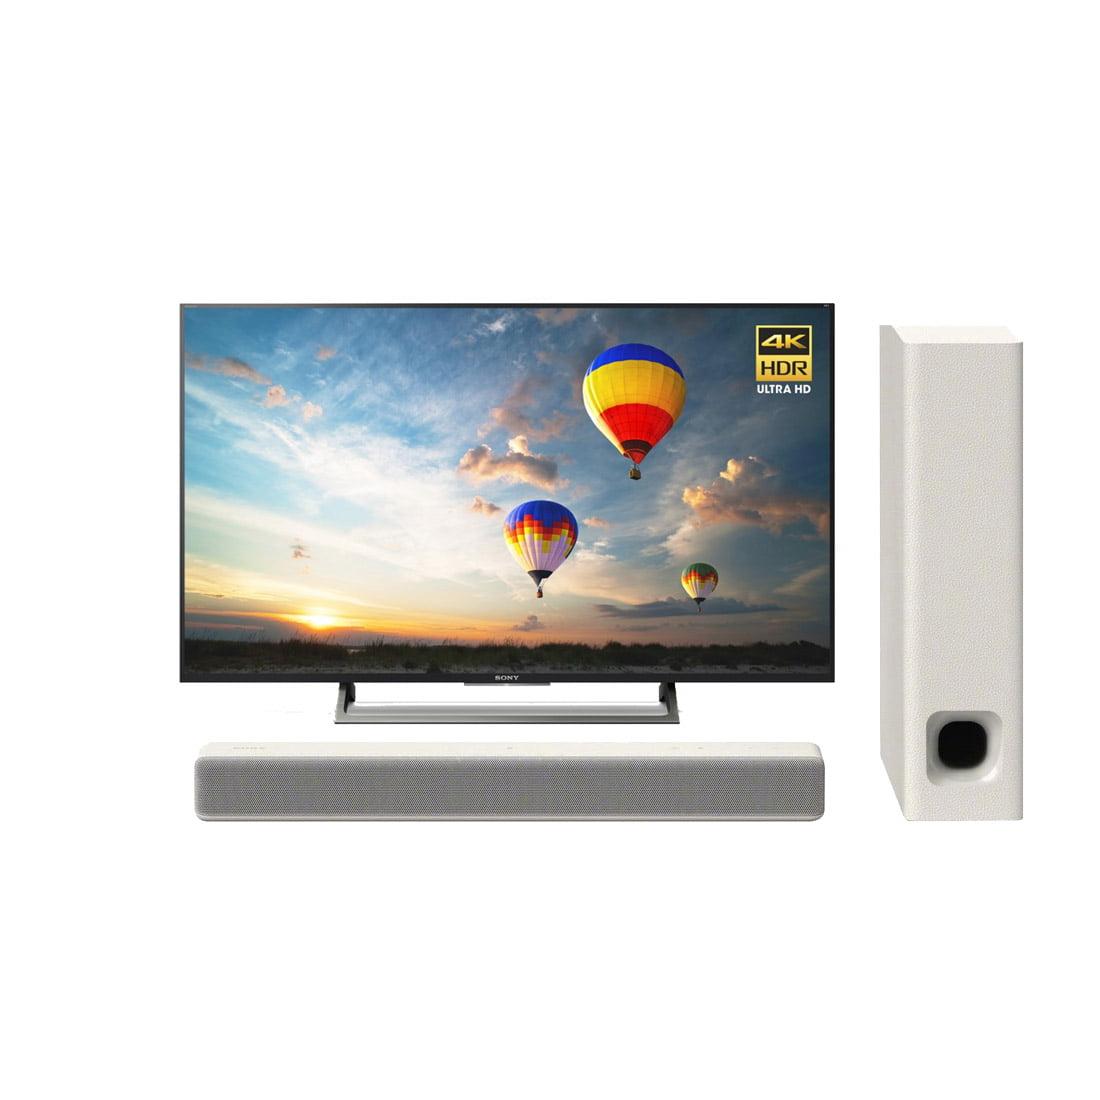 sony xbr 49x800e 49 led 4k smart tv ht mt300 w 100w 2 1. Black Bedroom Furniture Sets. Home Design Ideas